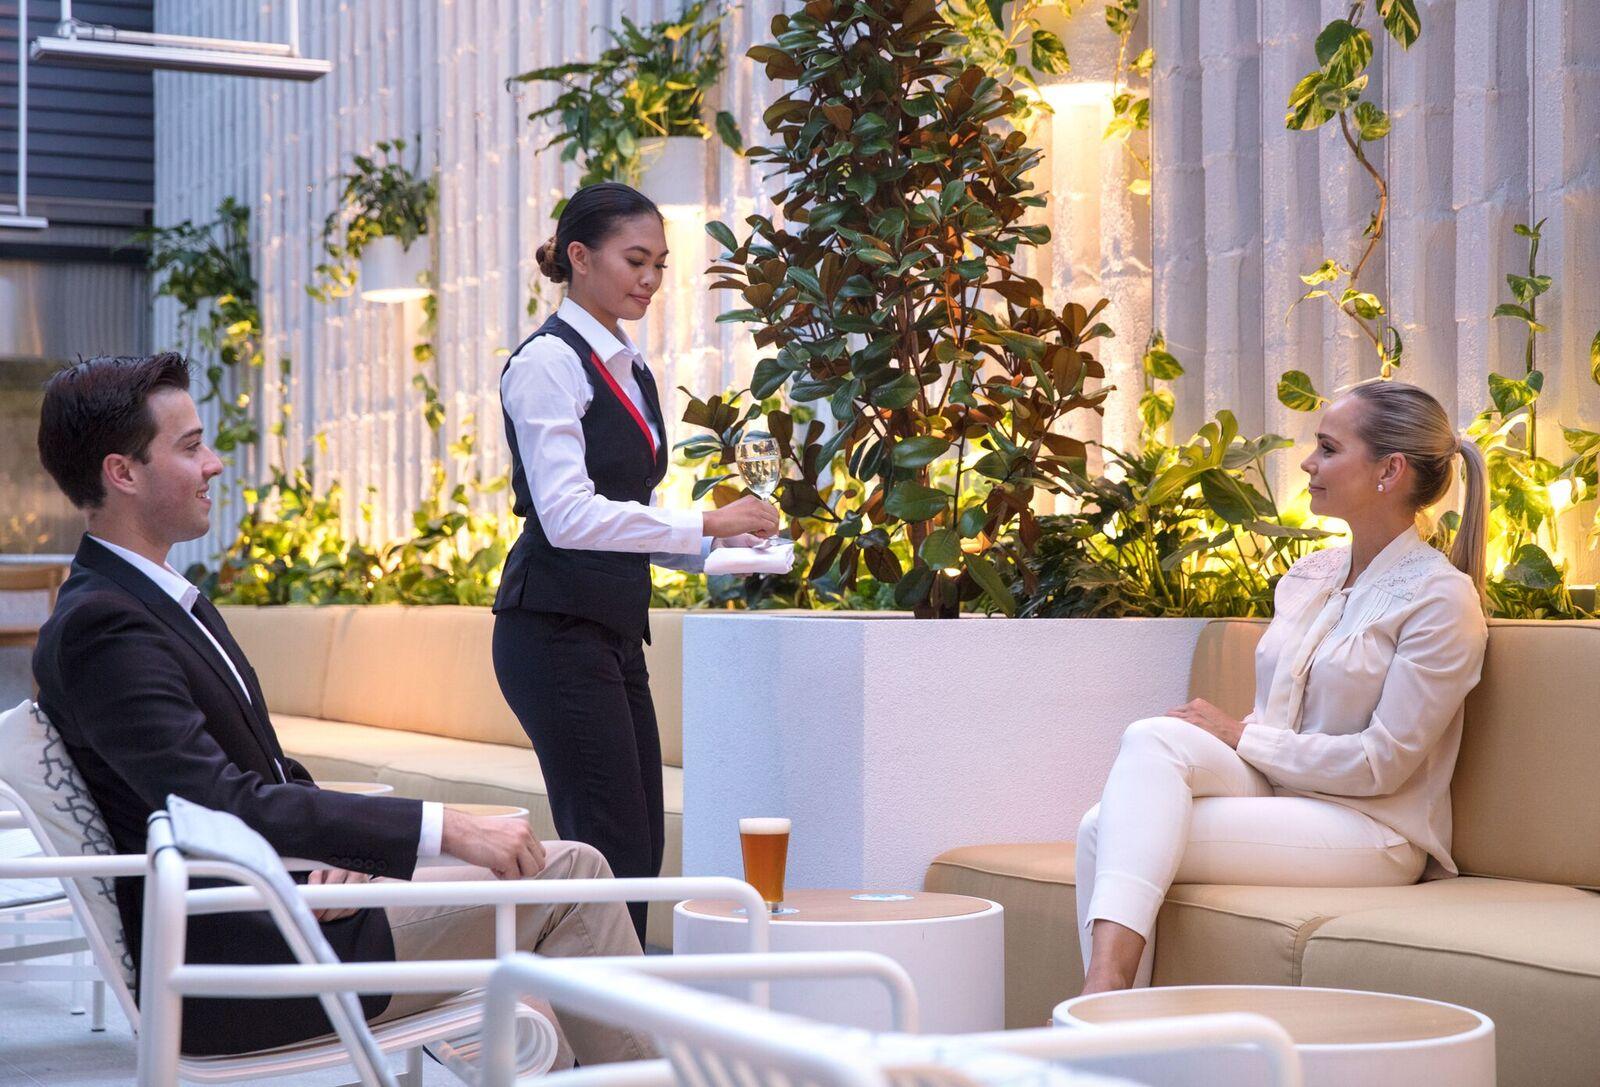 Qantas Perth Transit Lounge Outdoor BBQ area